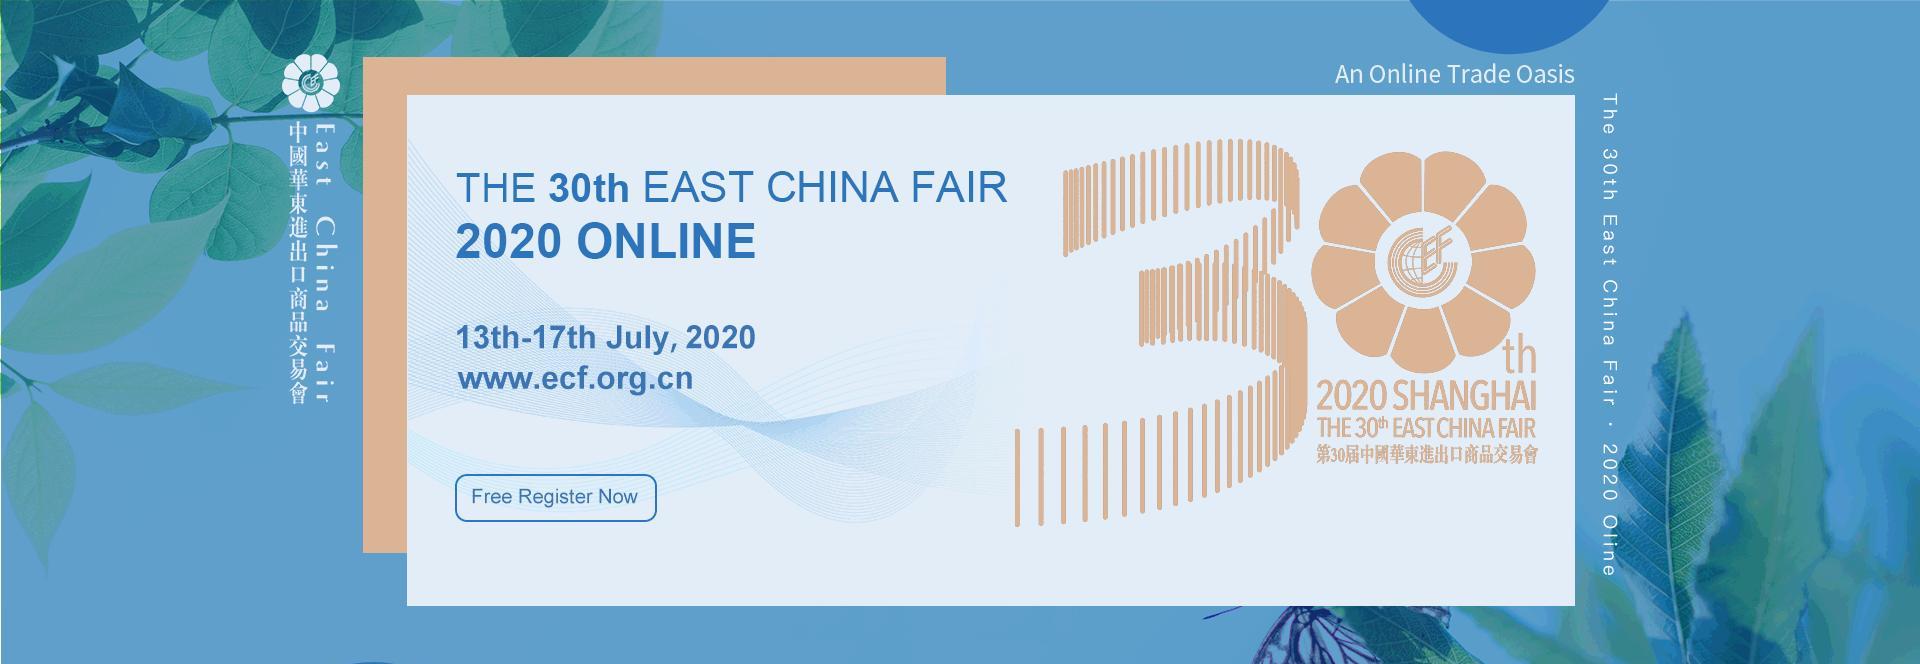 East China Fair 2020